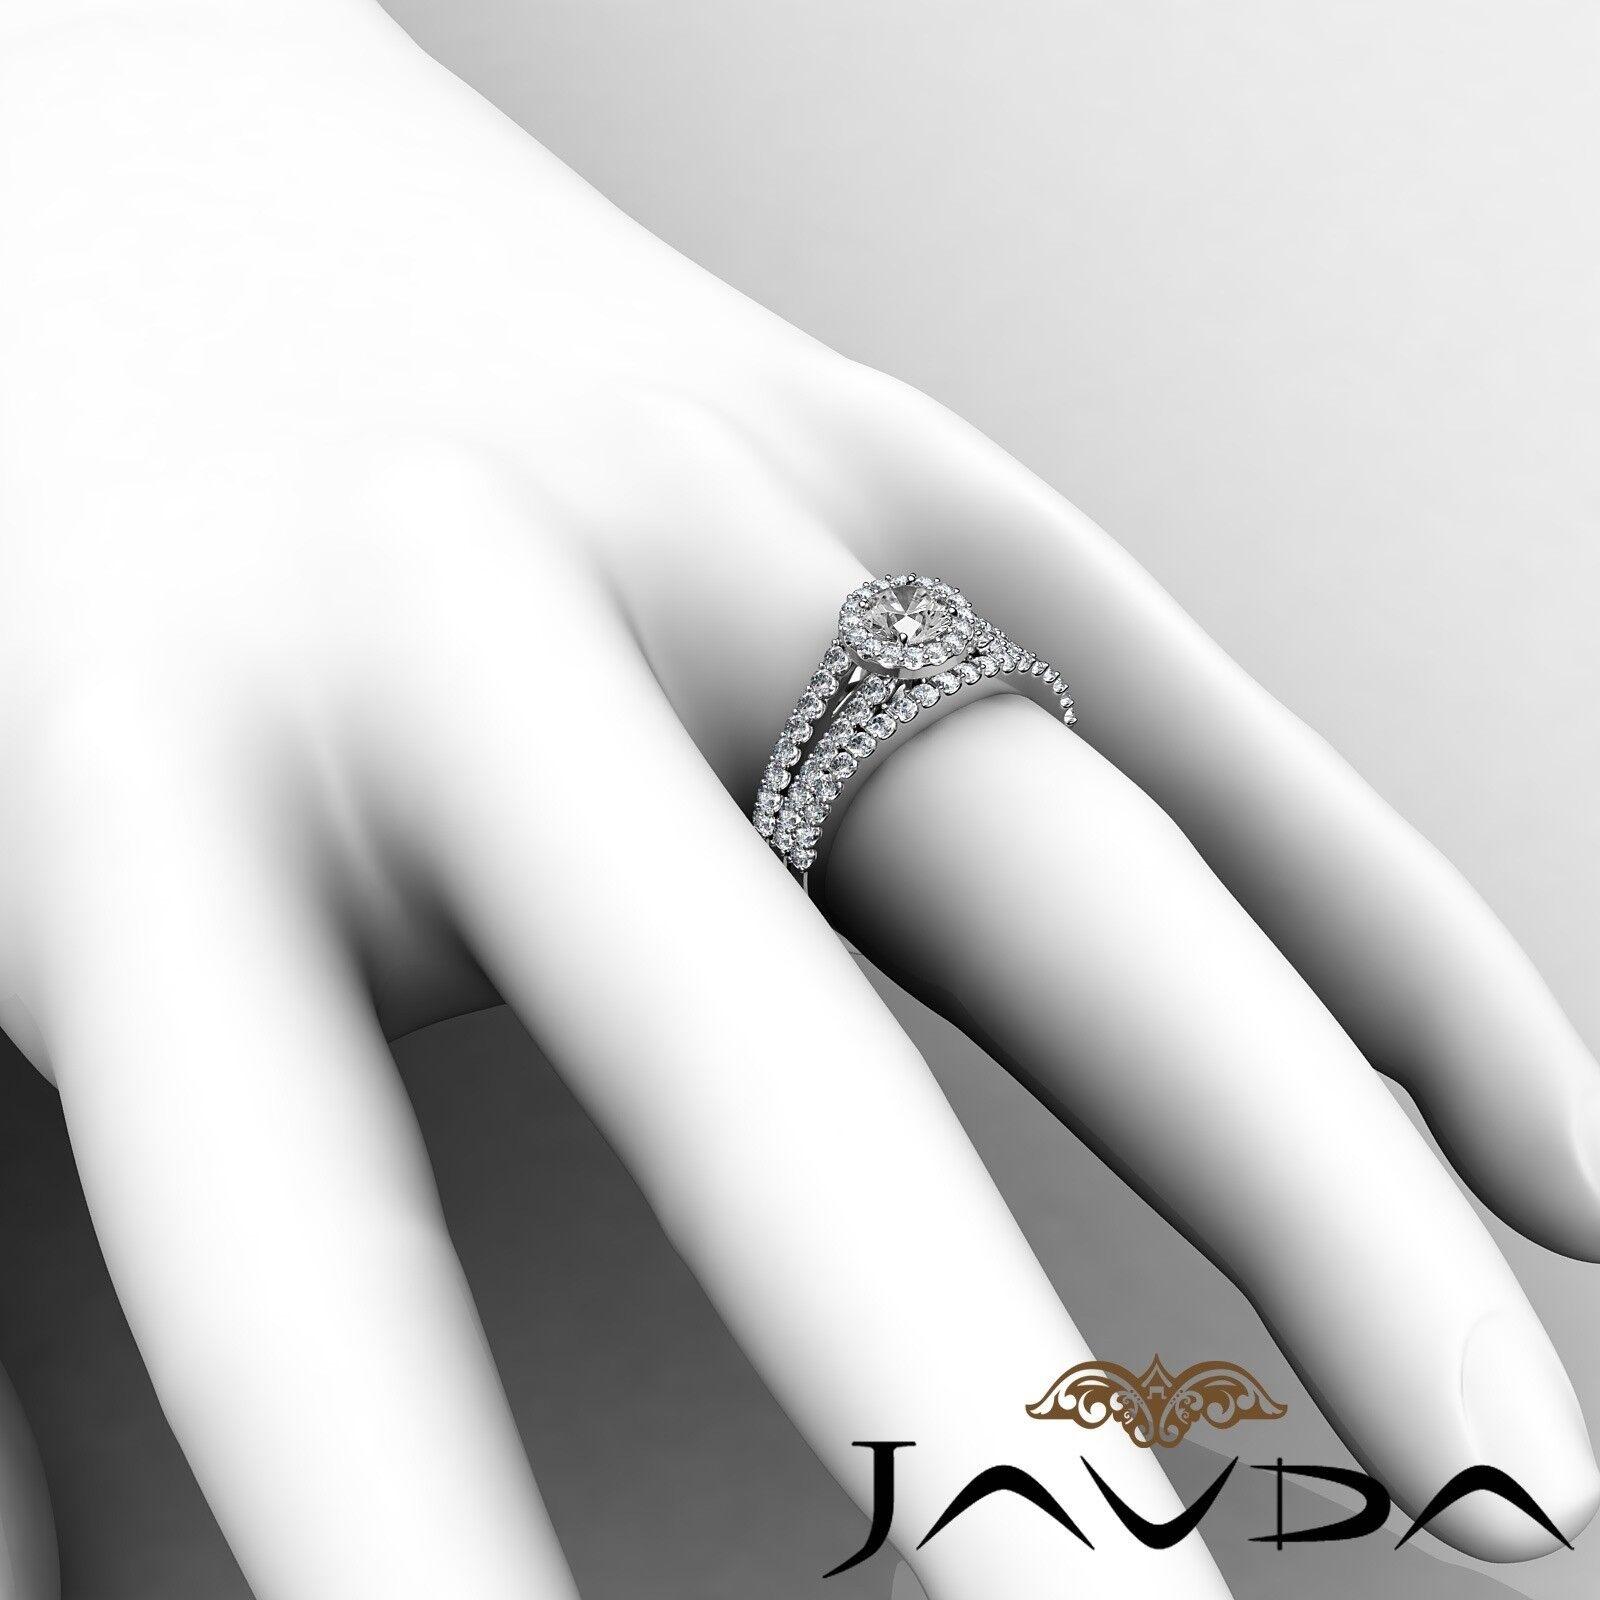 1.85ctw Luxurious Wedding Bridal Round Diamond Engagement Ring GIA G-VVS1 W Gold 6